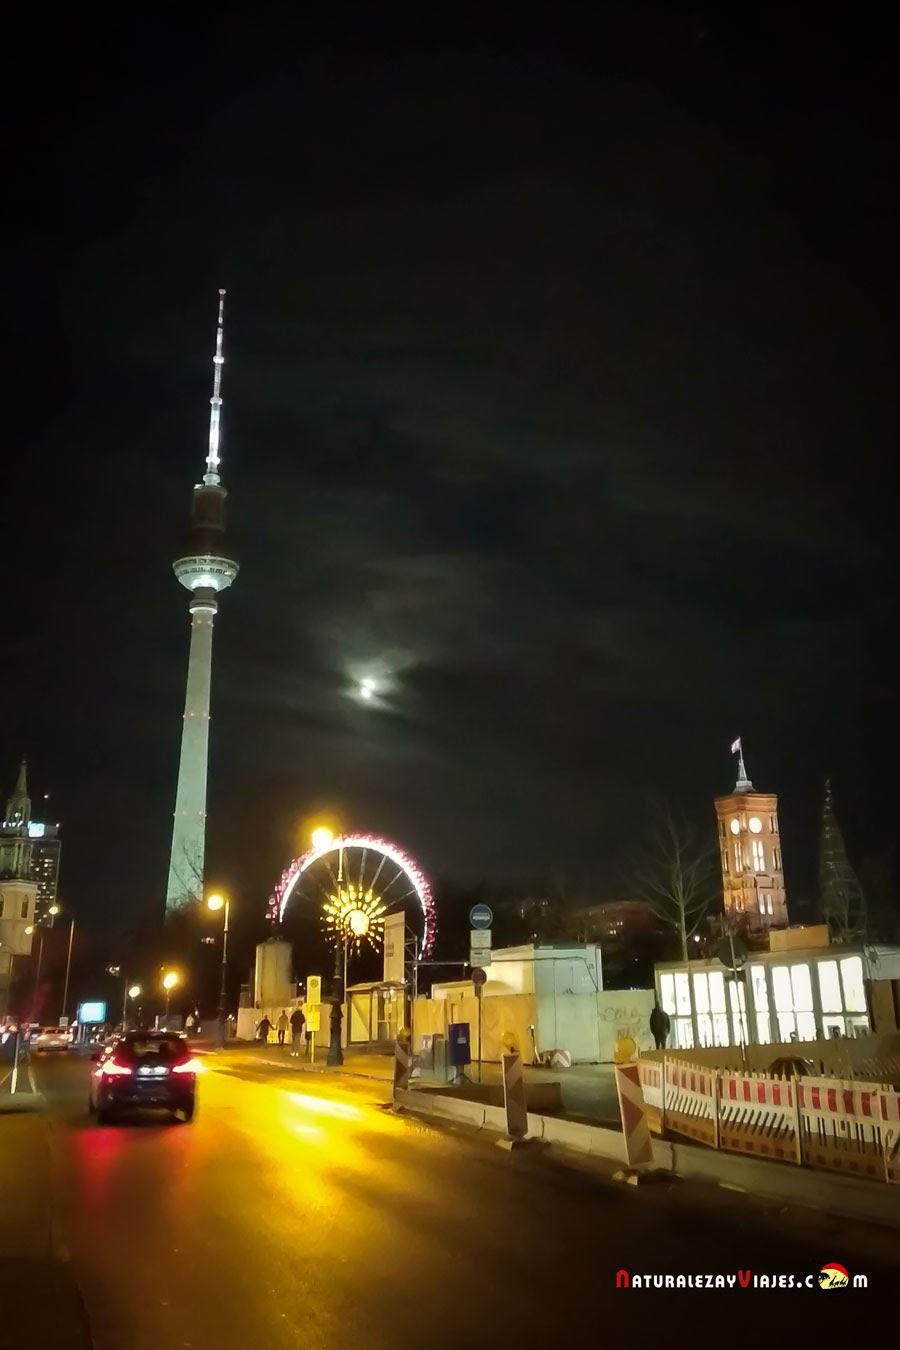 Mercado de Navidad Roter Rathaus en Berlín